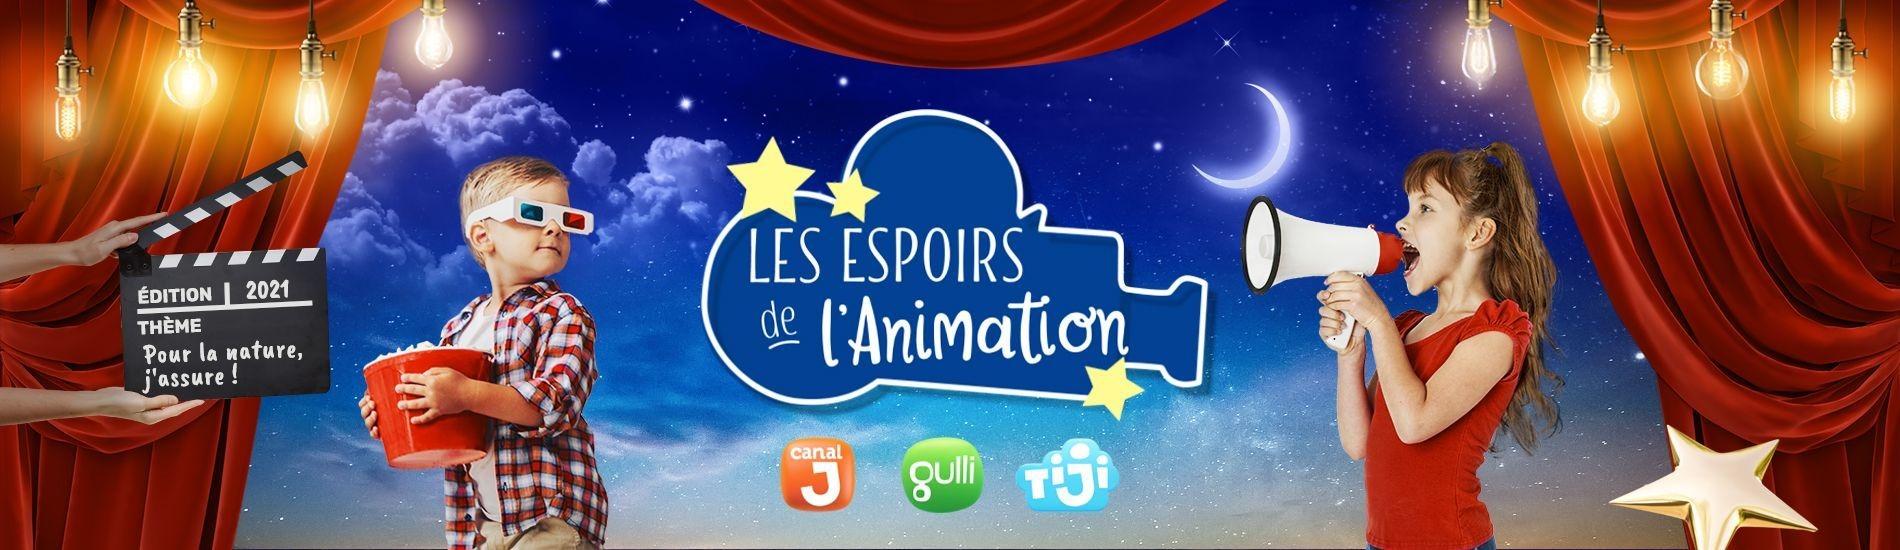 Les Espoirs de l'Animation 2021 en streaming sur Gulli Replay